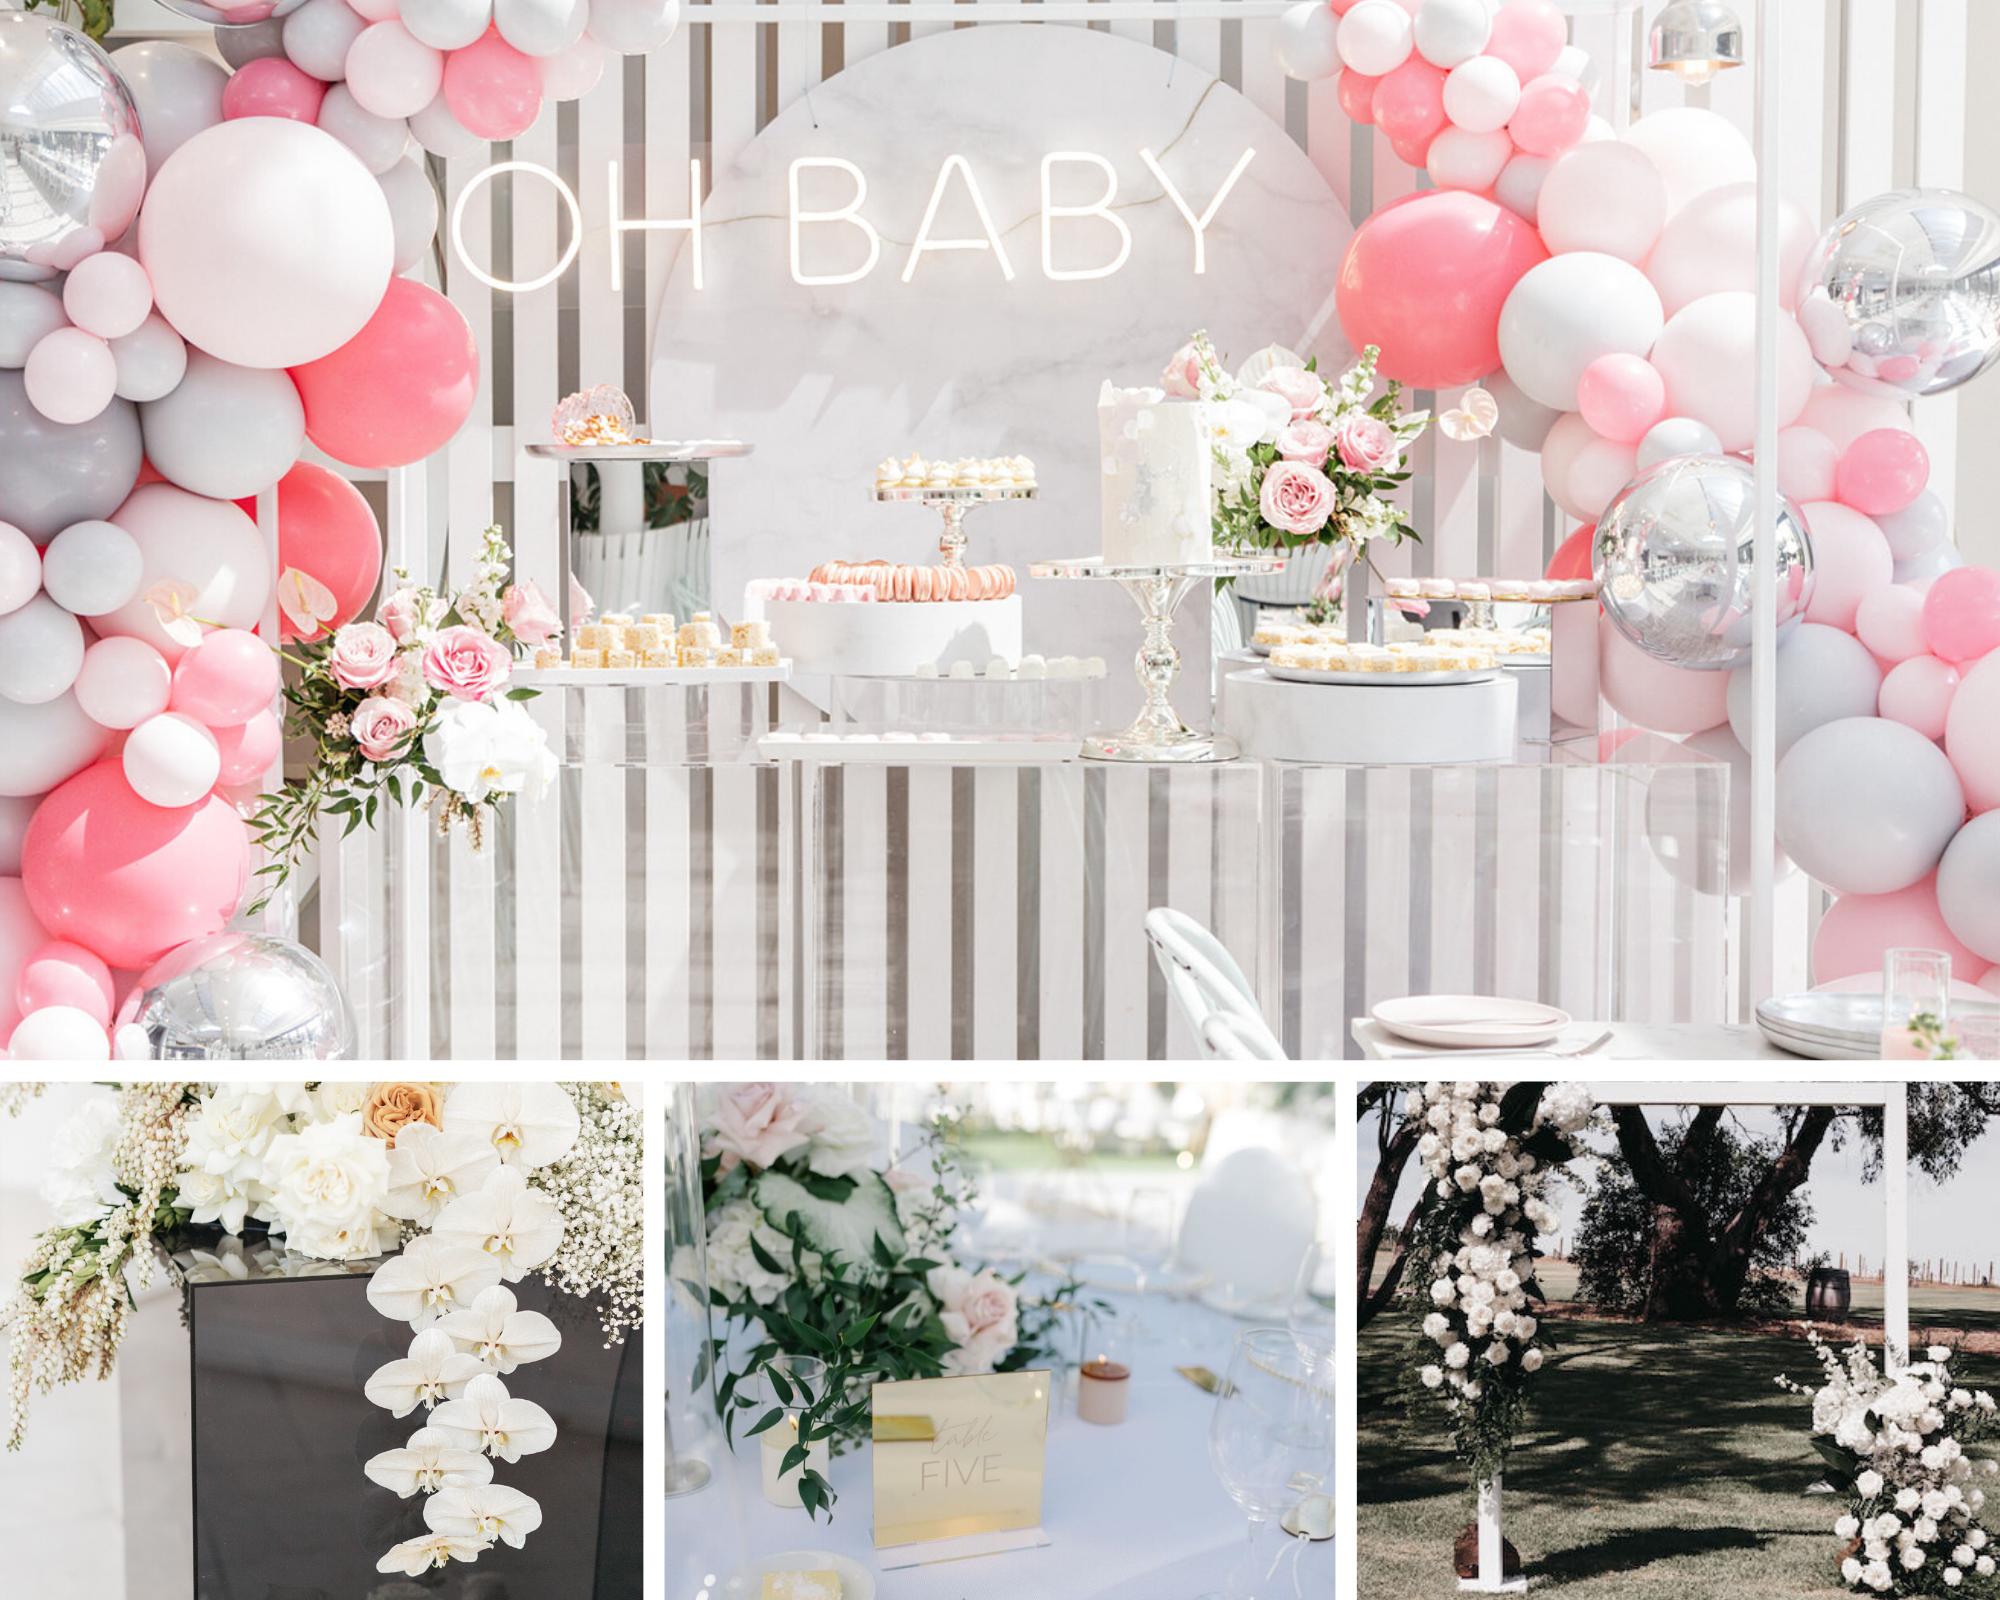 hire, adelaide, wedding, backdrop, frame, linen, napkin, cutlery, event, party